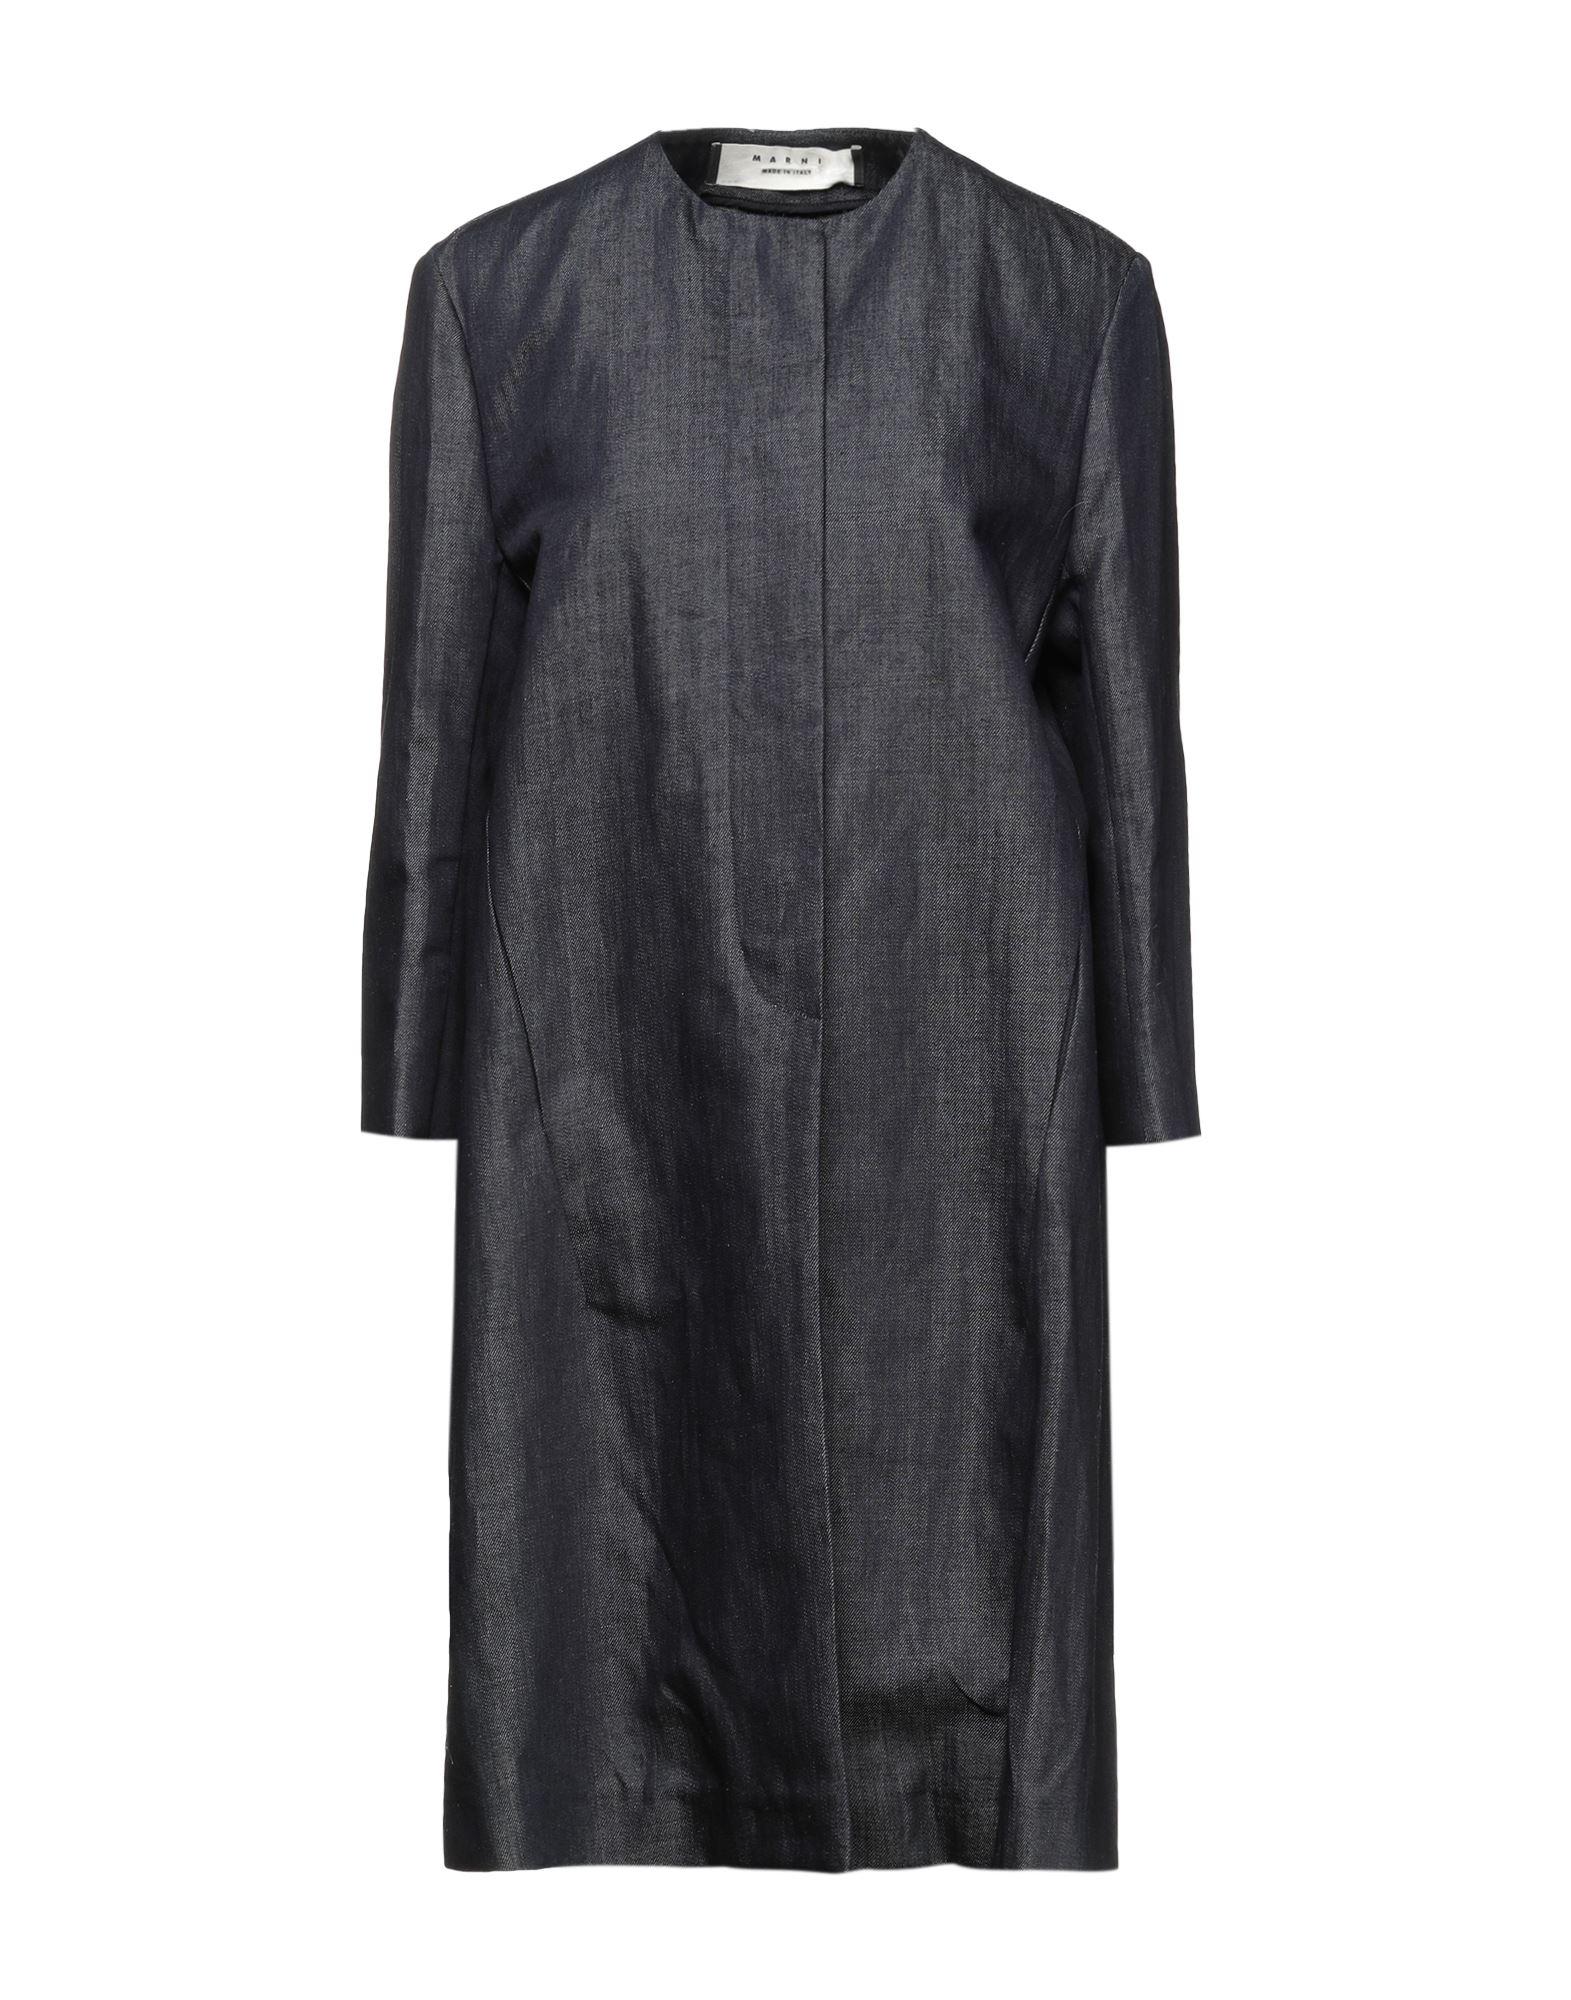 MARNI Джинсовая верхняя одежда верхняя одежда